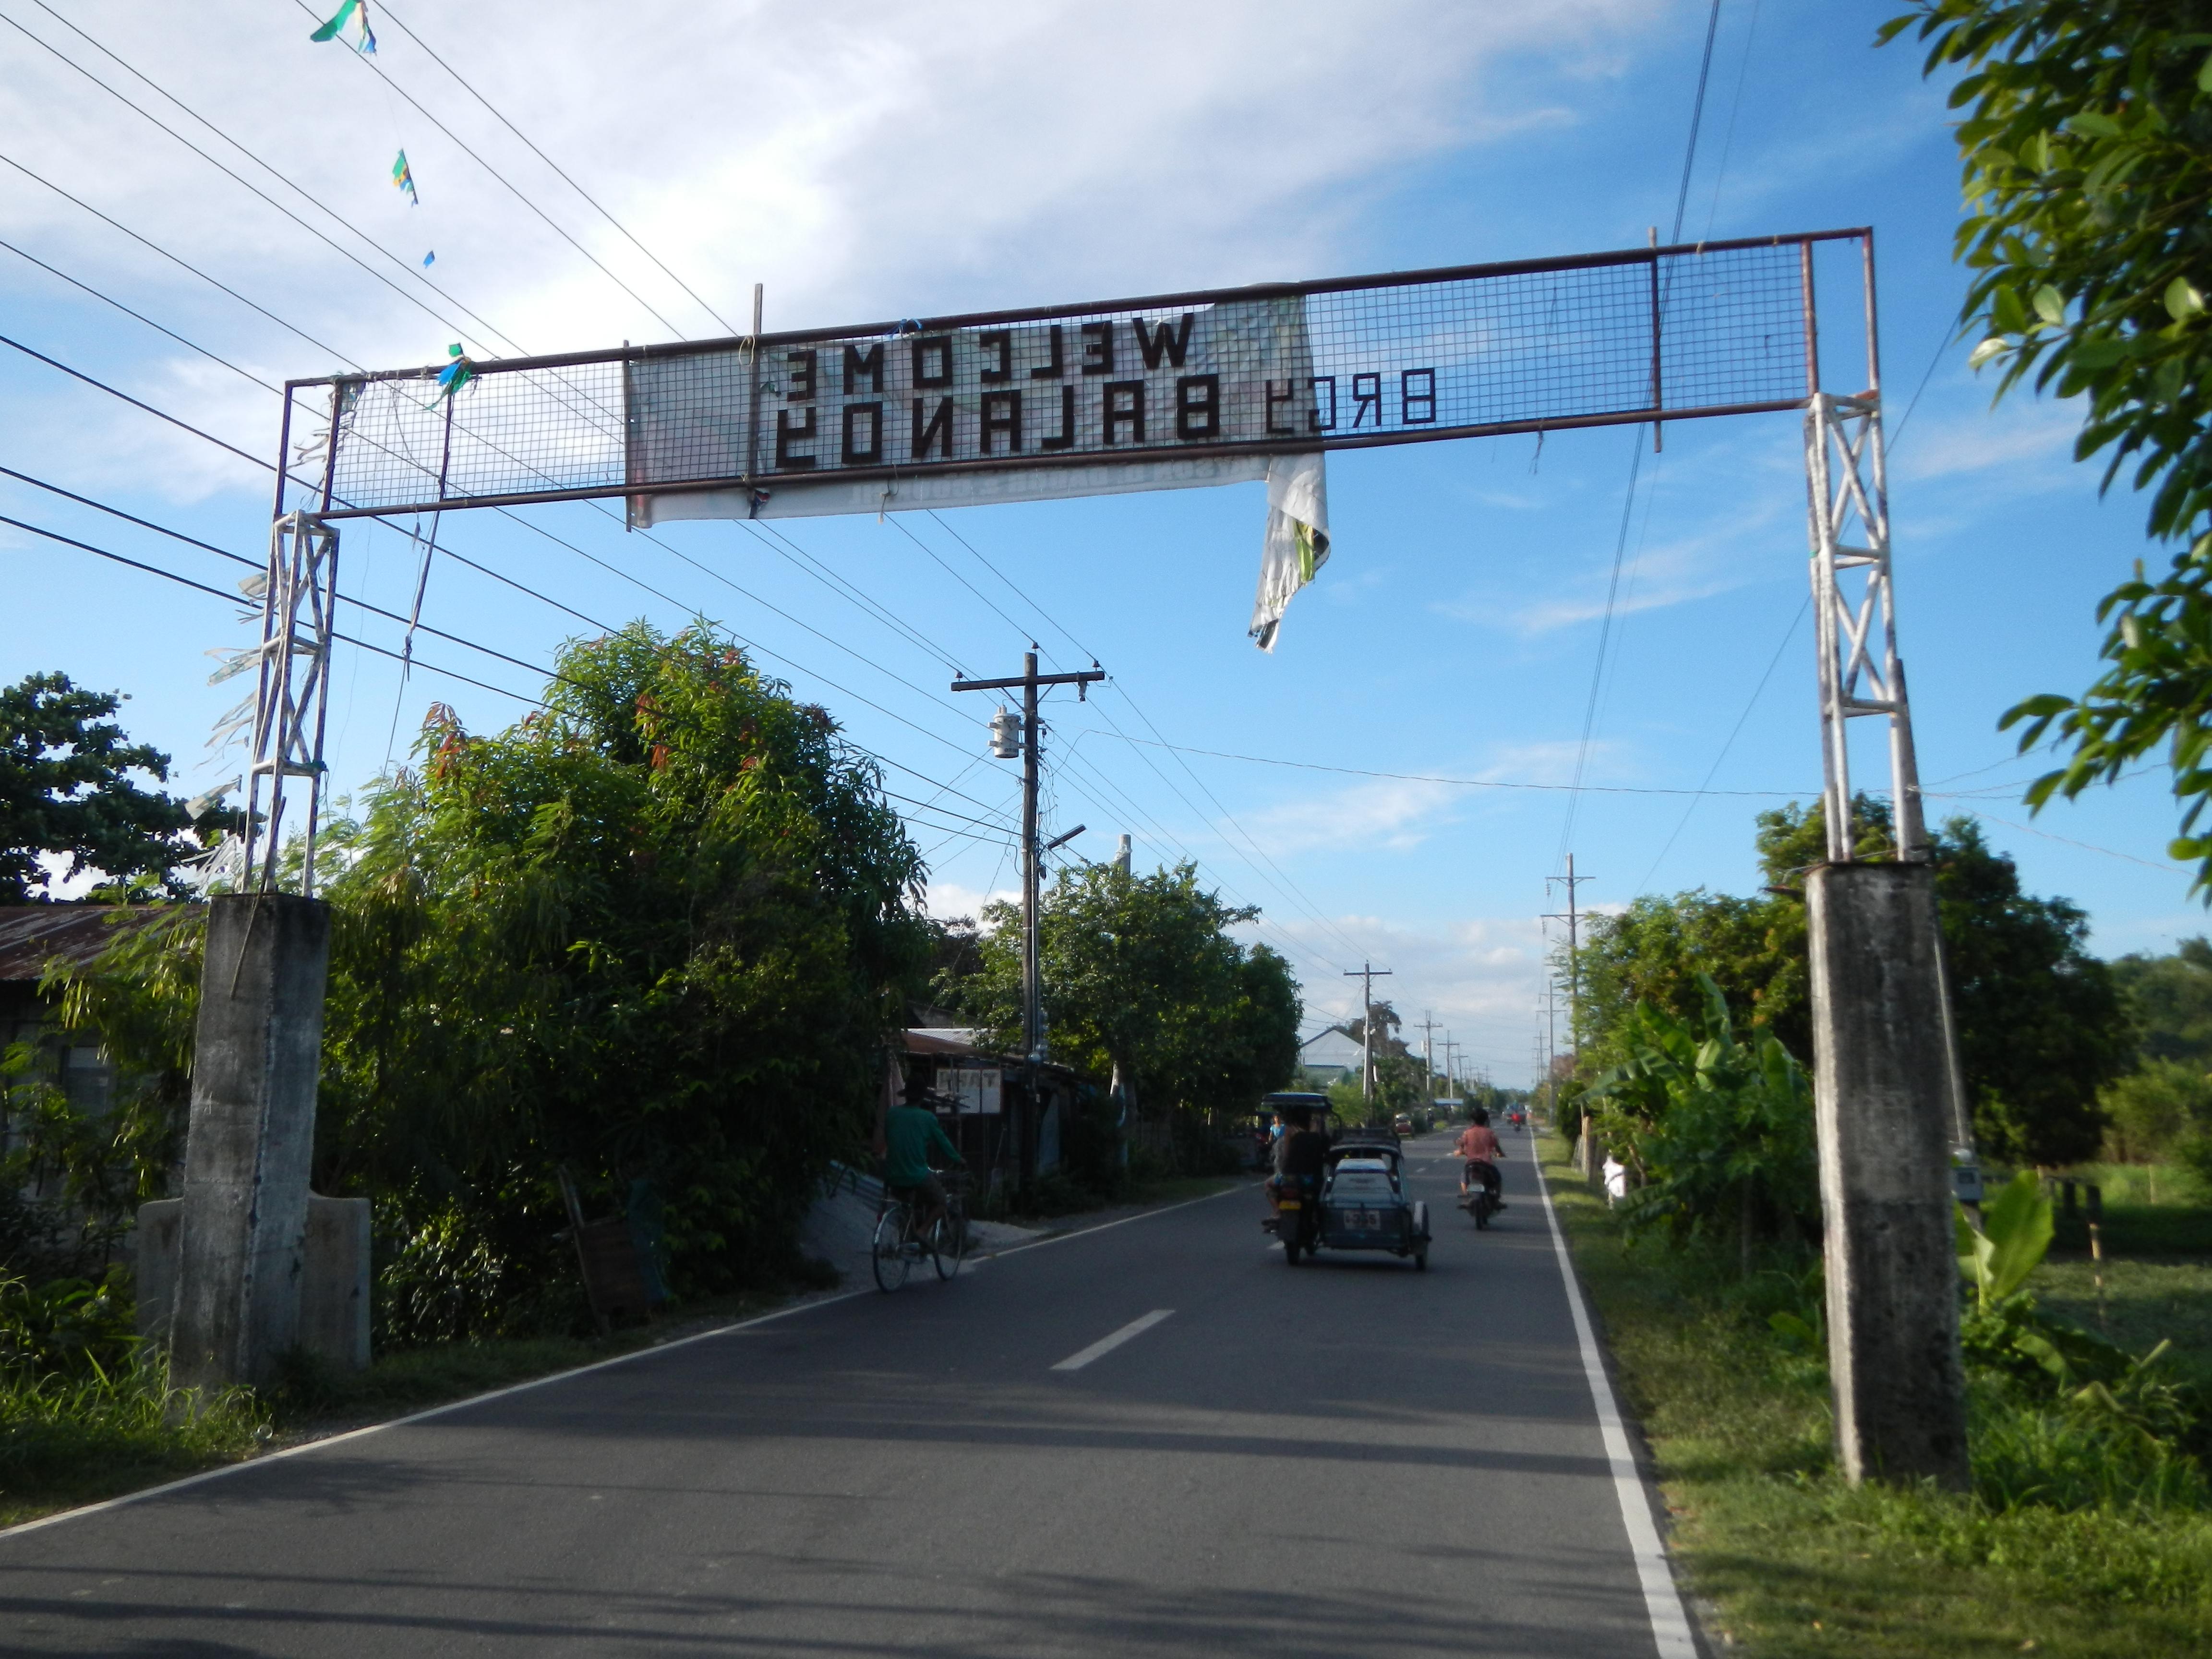 File:7717jfRizal Balanoy La Paz Hall Welcome Tarlacfvf 15 ...